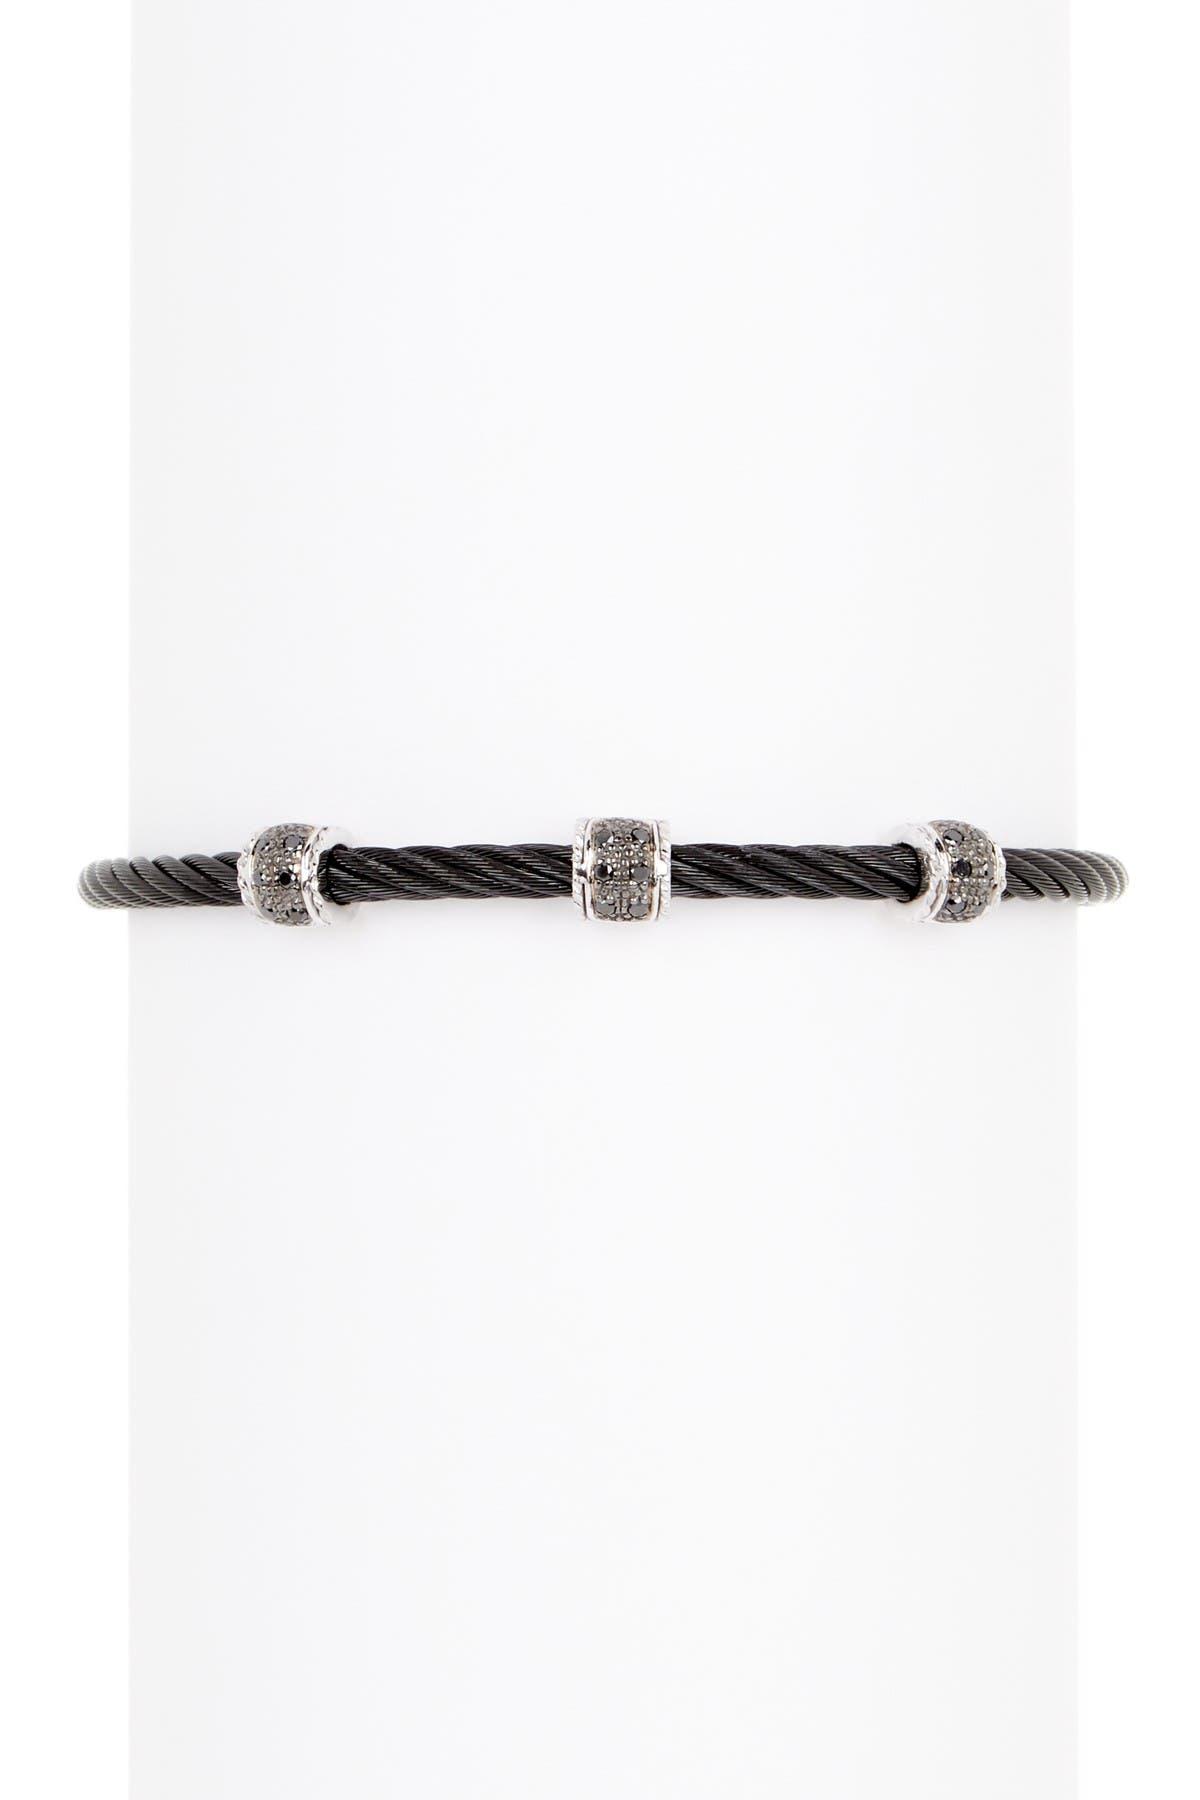 Image of ALOR 18K White Gold Stainless Steel Black Diamond Cable Bracelet - 0.16 ctw